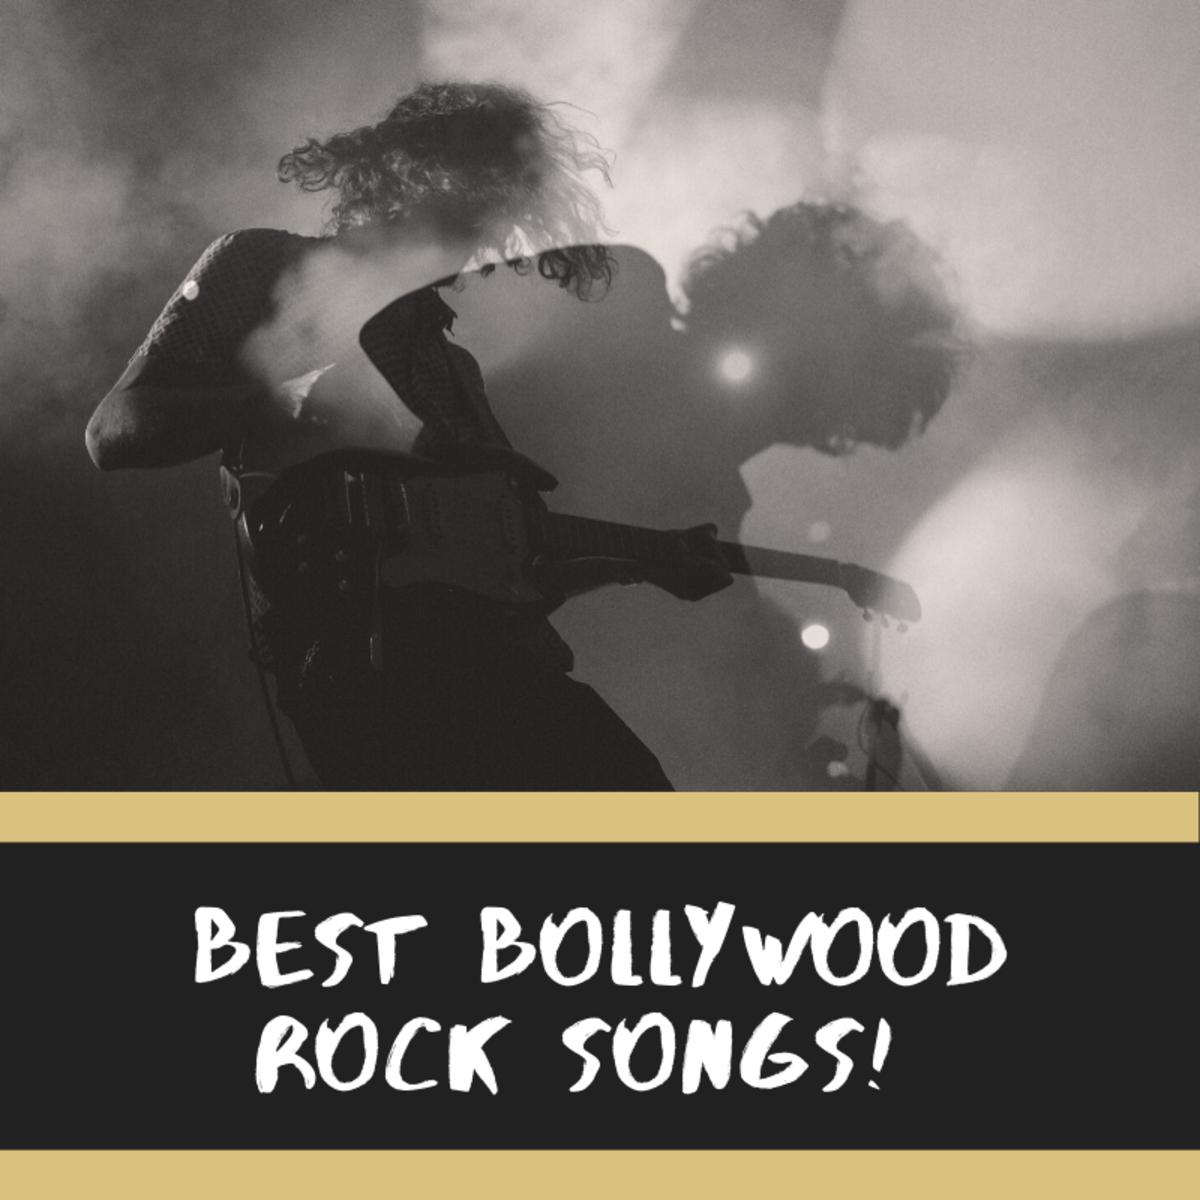 100 Best Bollywood Rock Songs